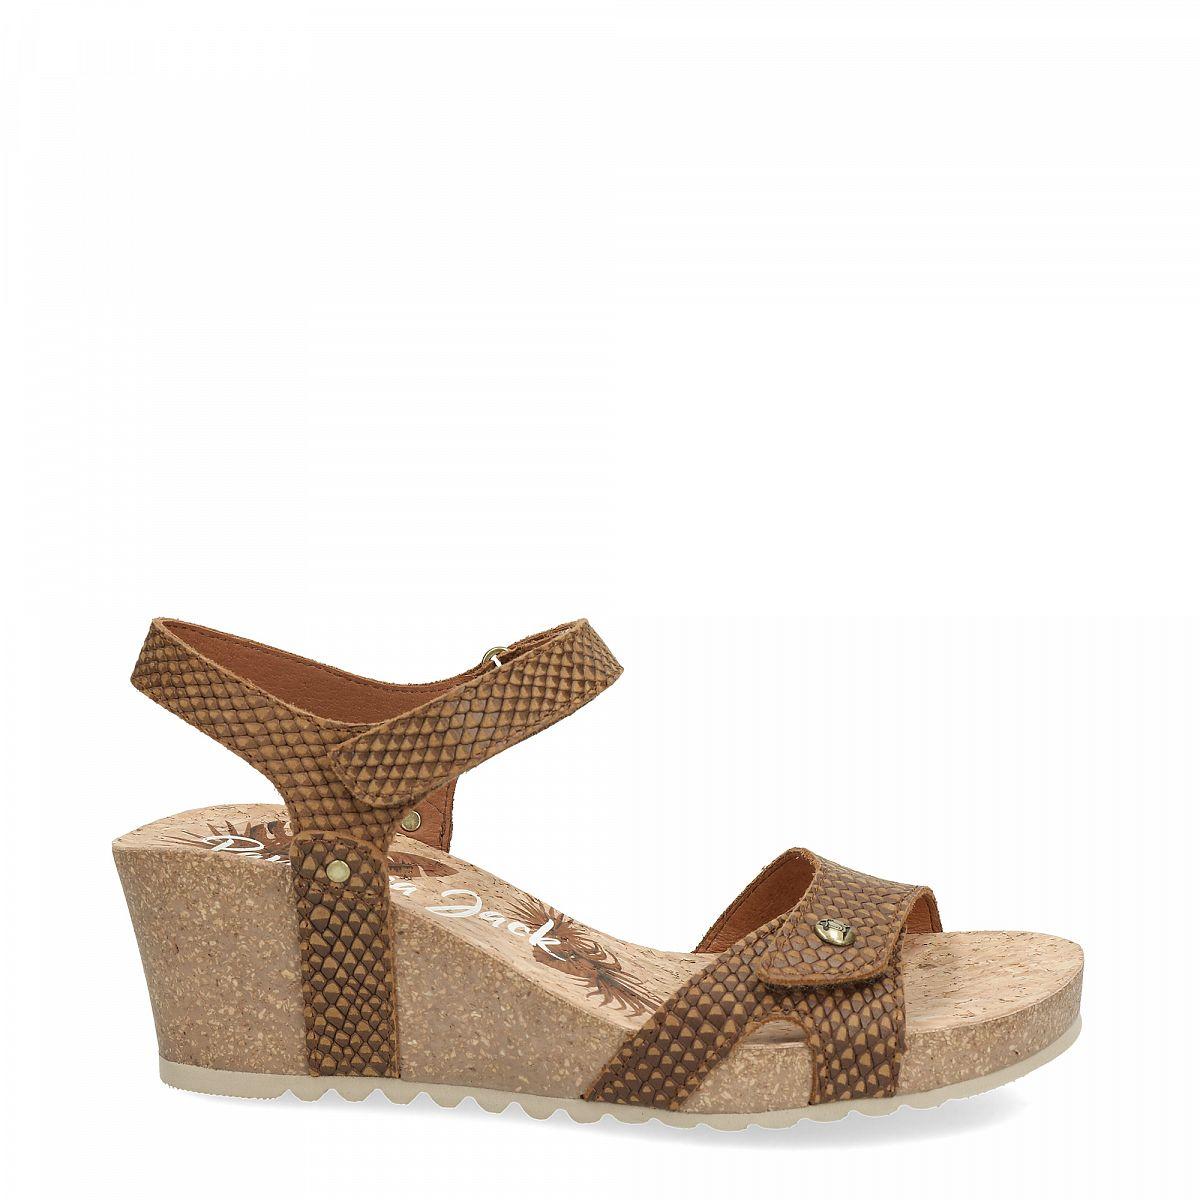 b07f7796164310 Women's sandals JULIA SNAKE bark | PANAMA JACK®